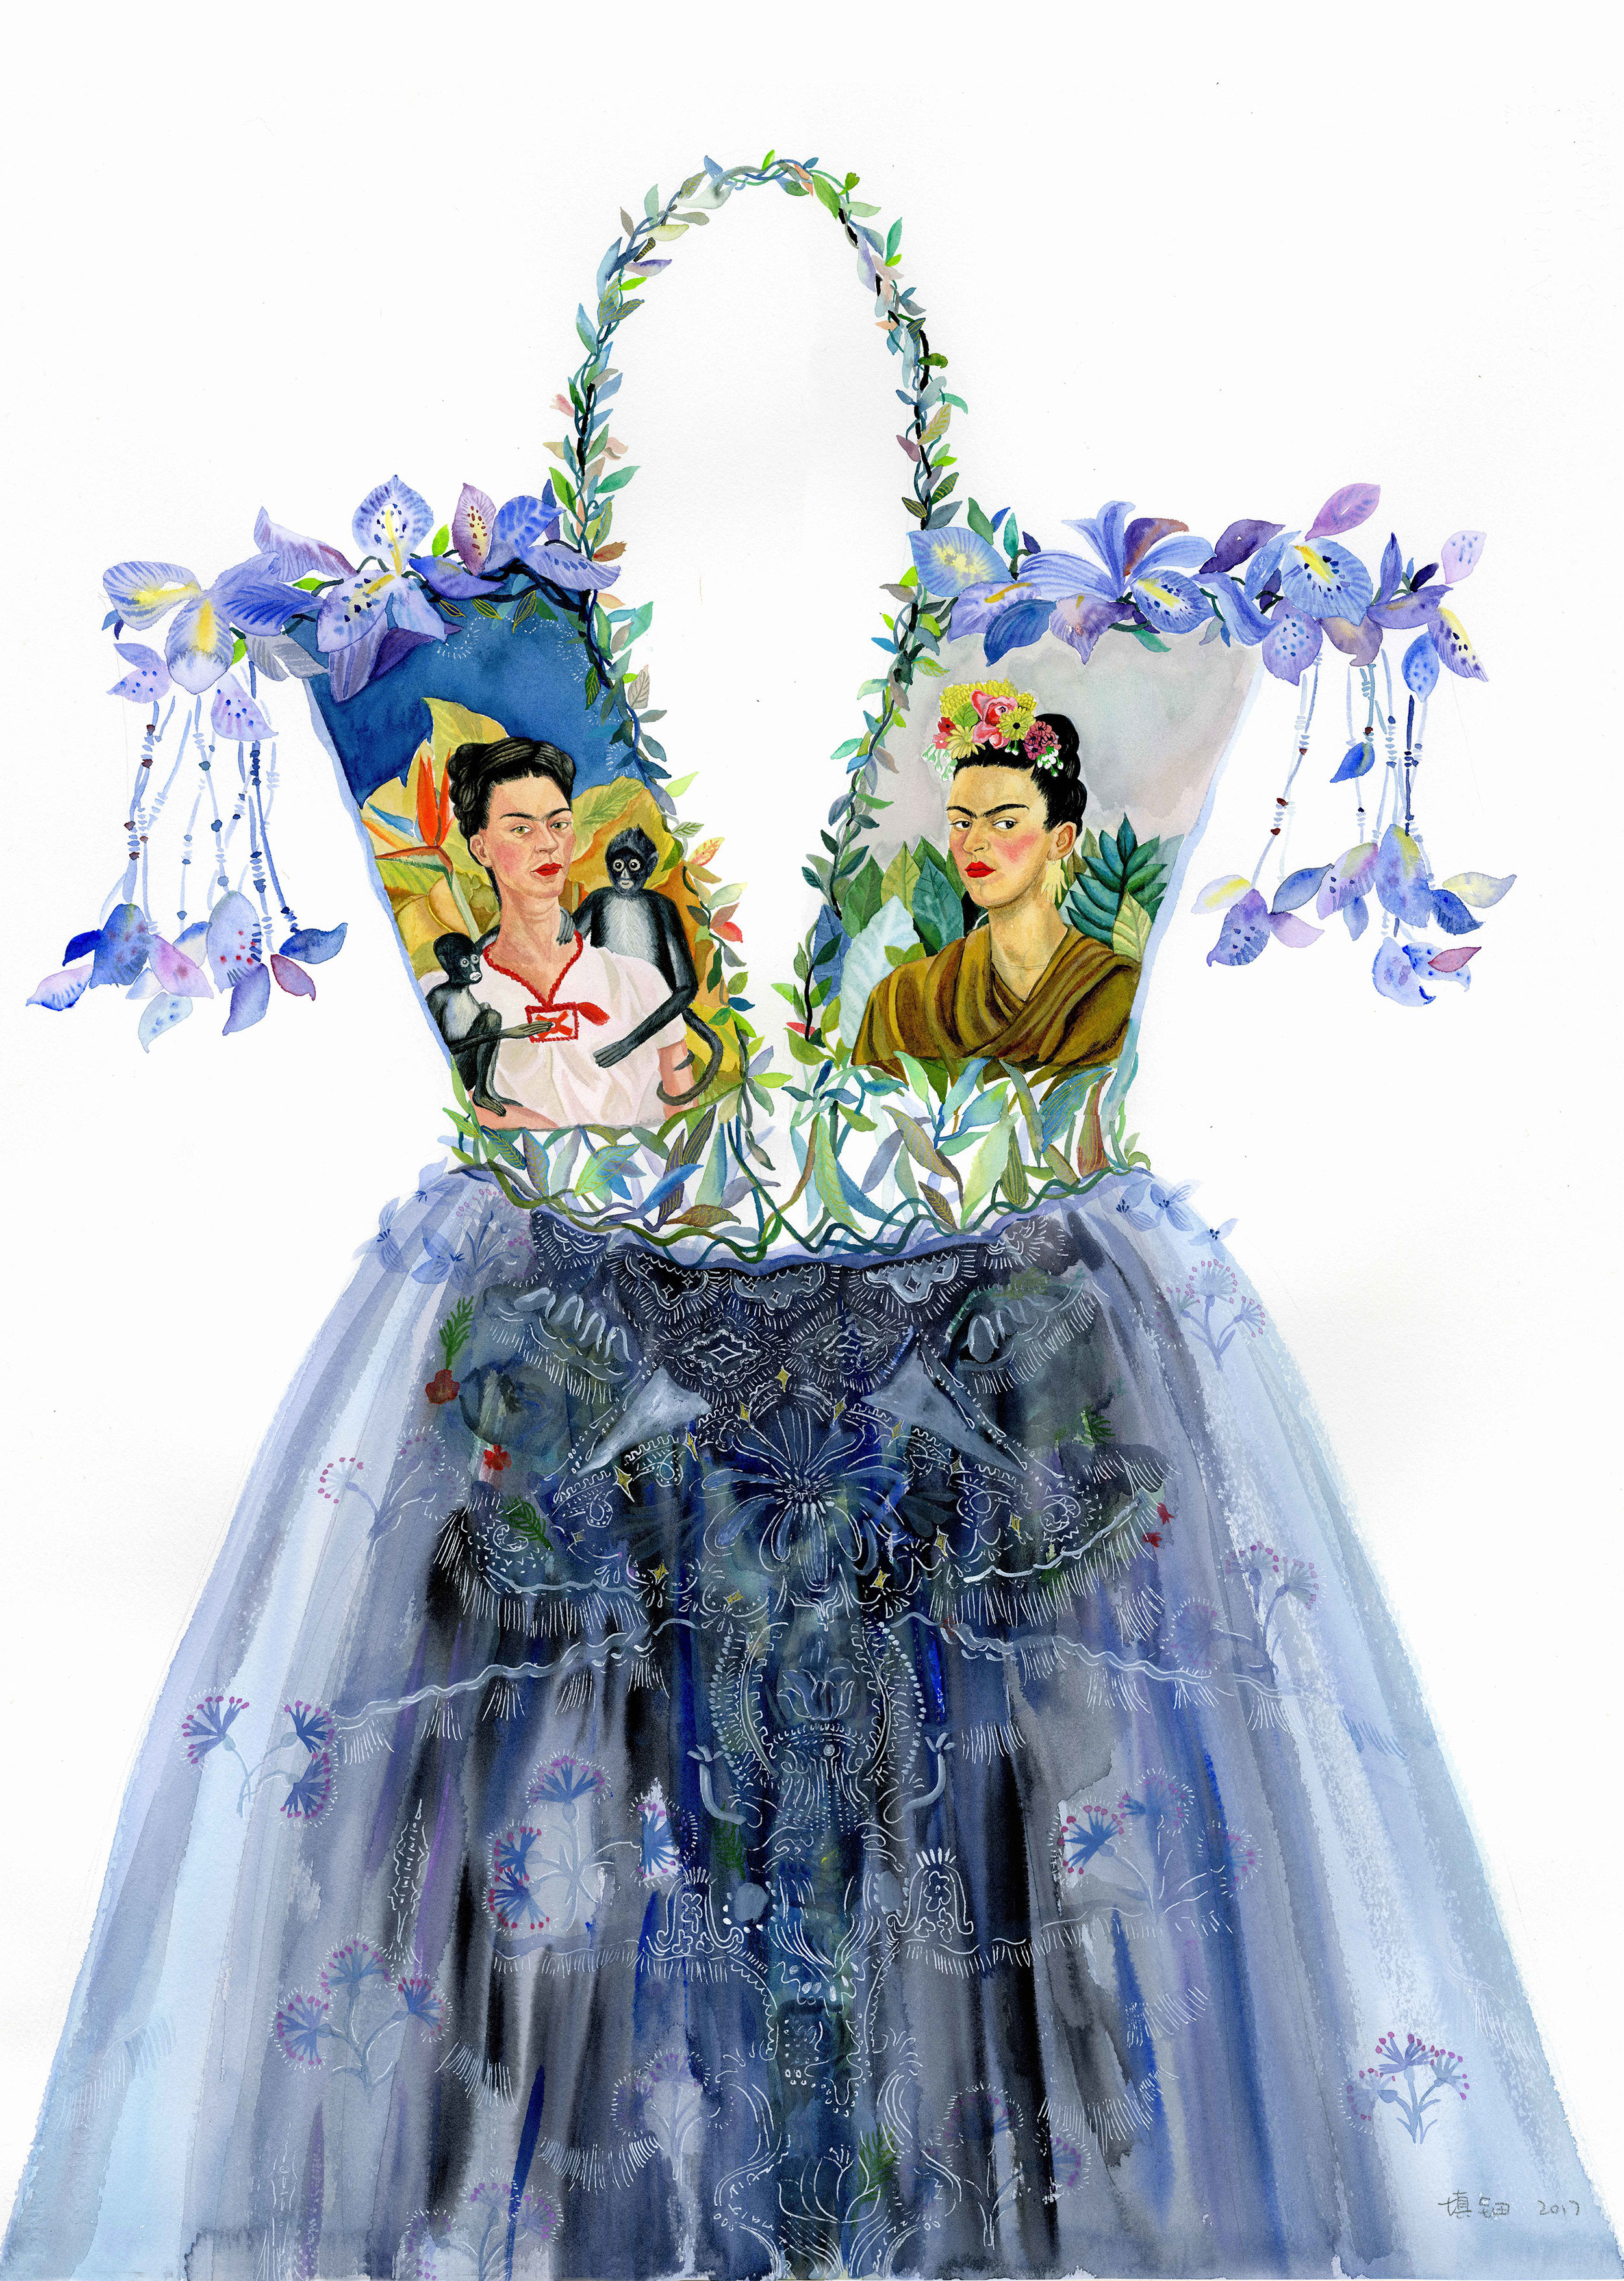 Frida-watercolor-on-JGallery.jpg